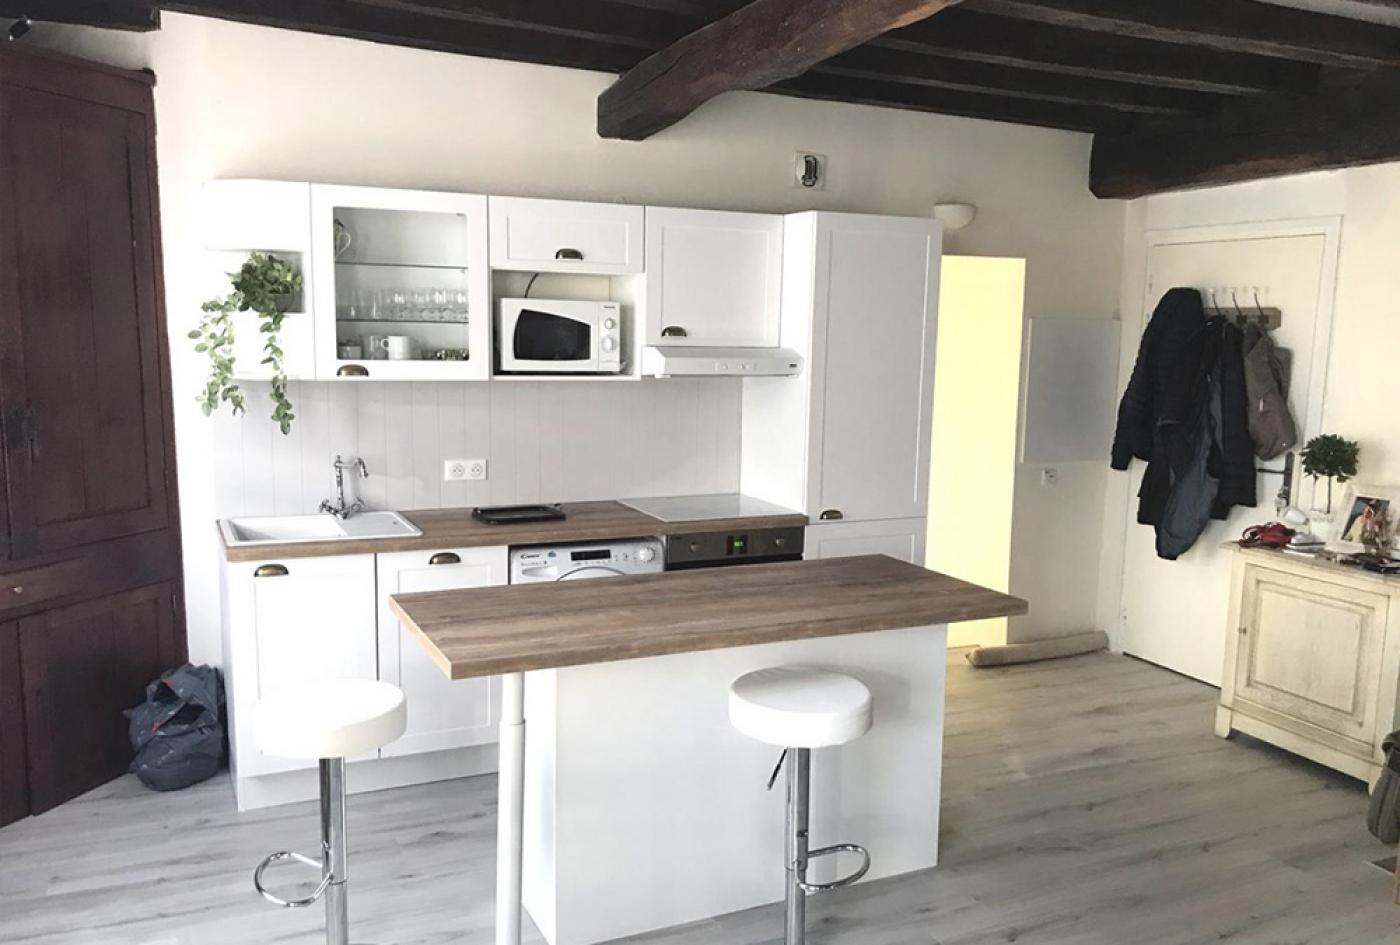 rénovation cuisine pays basque